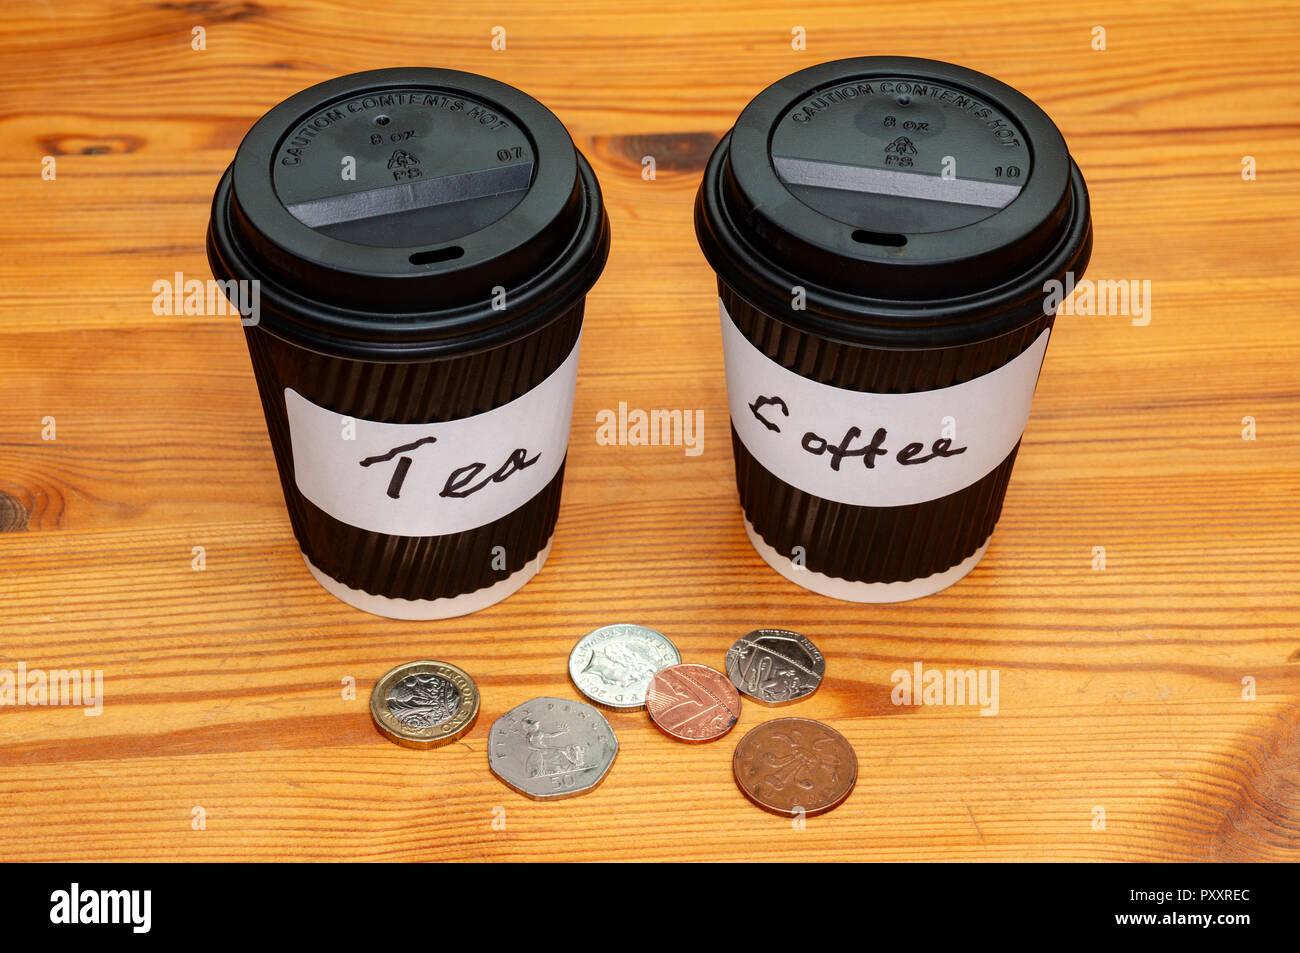 Take away tea and coffee - Stock Image